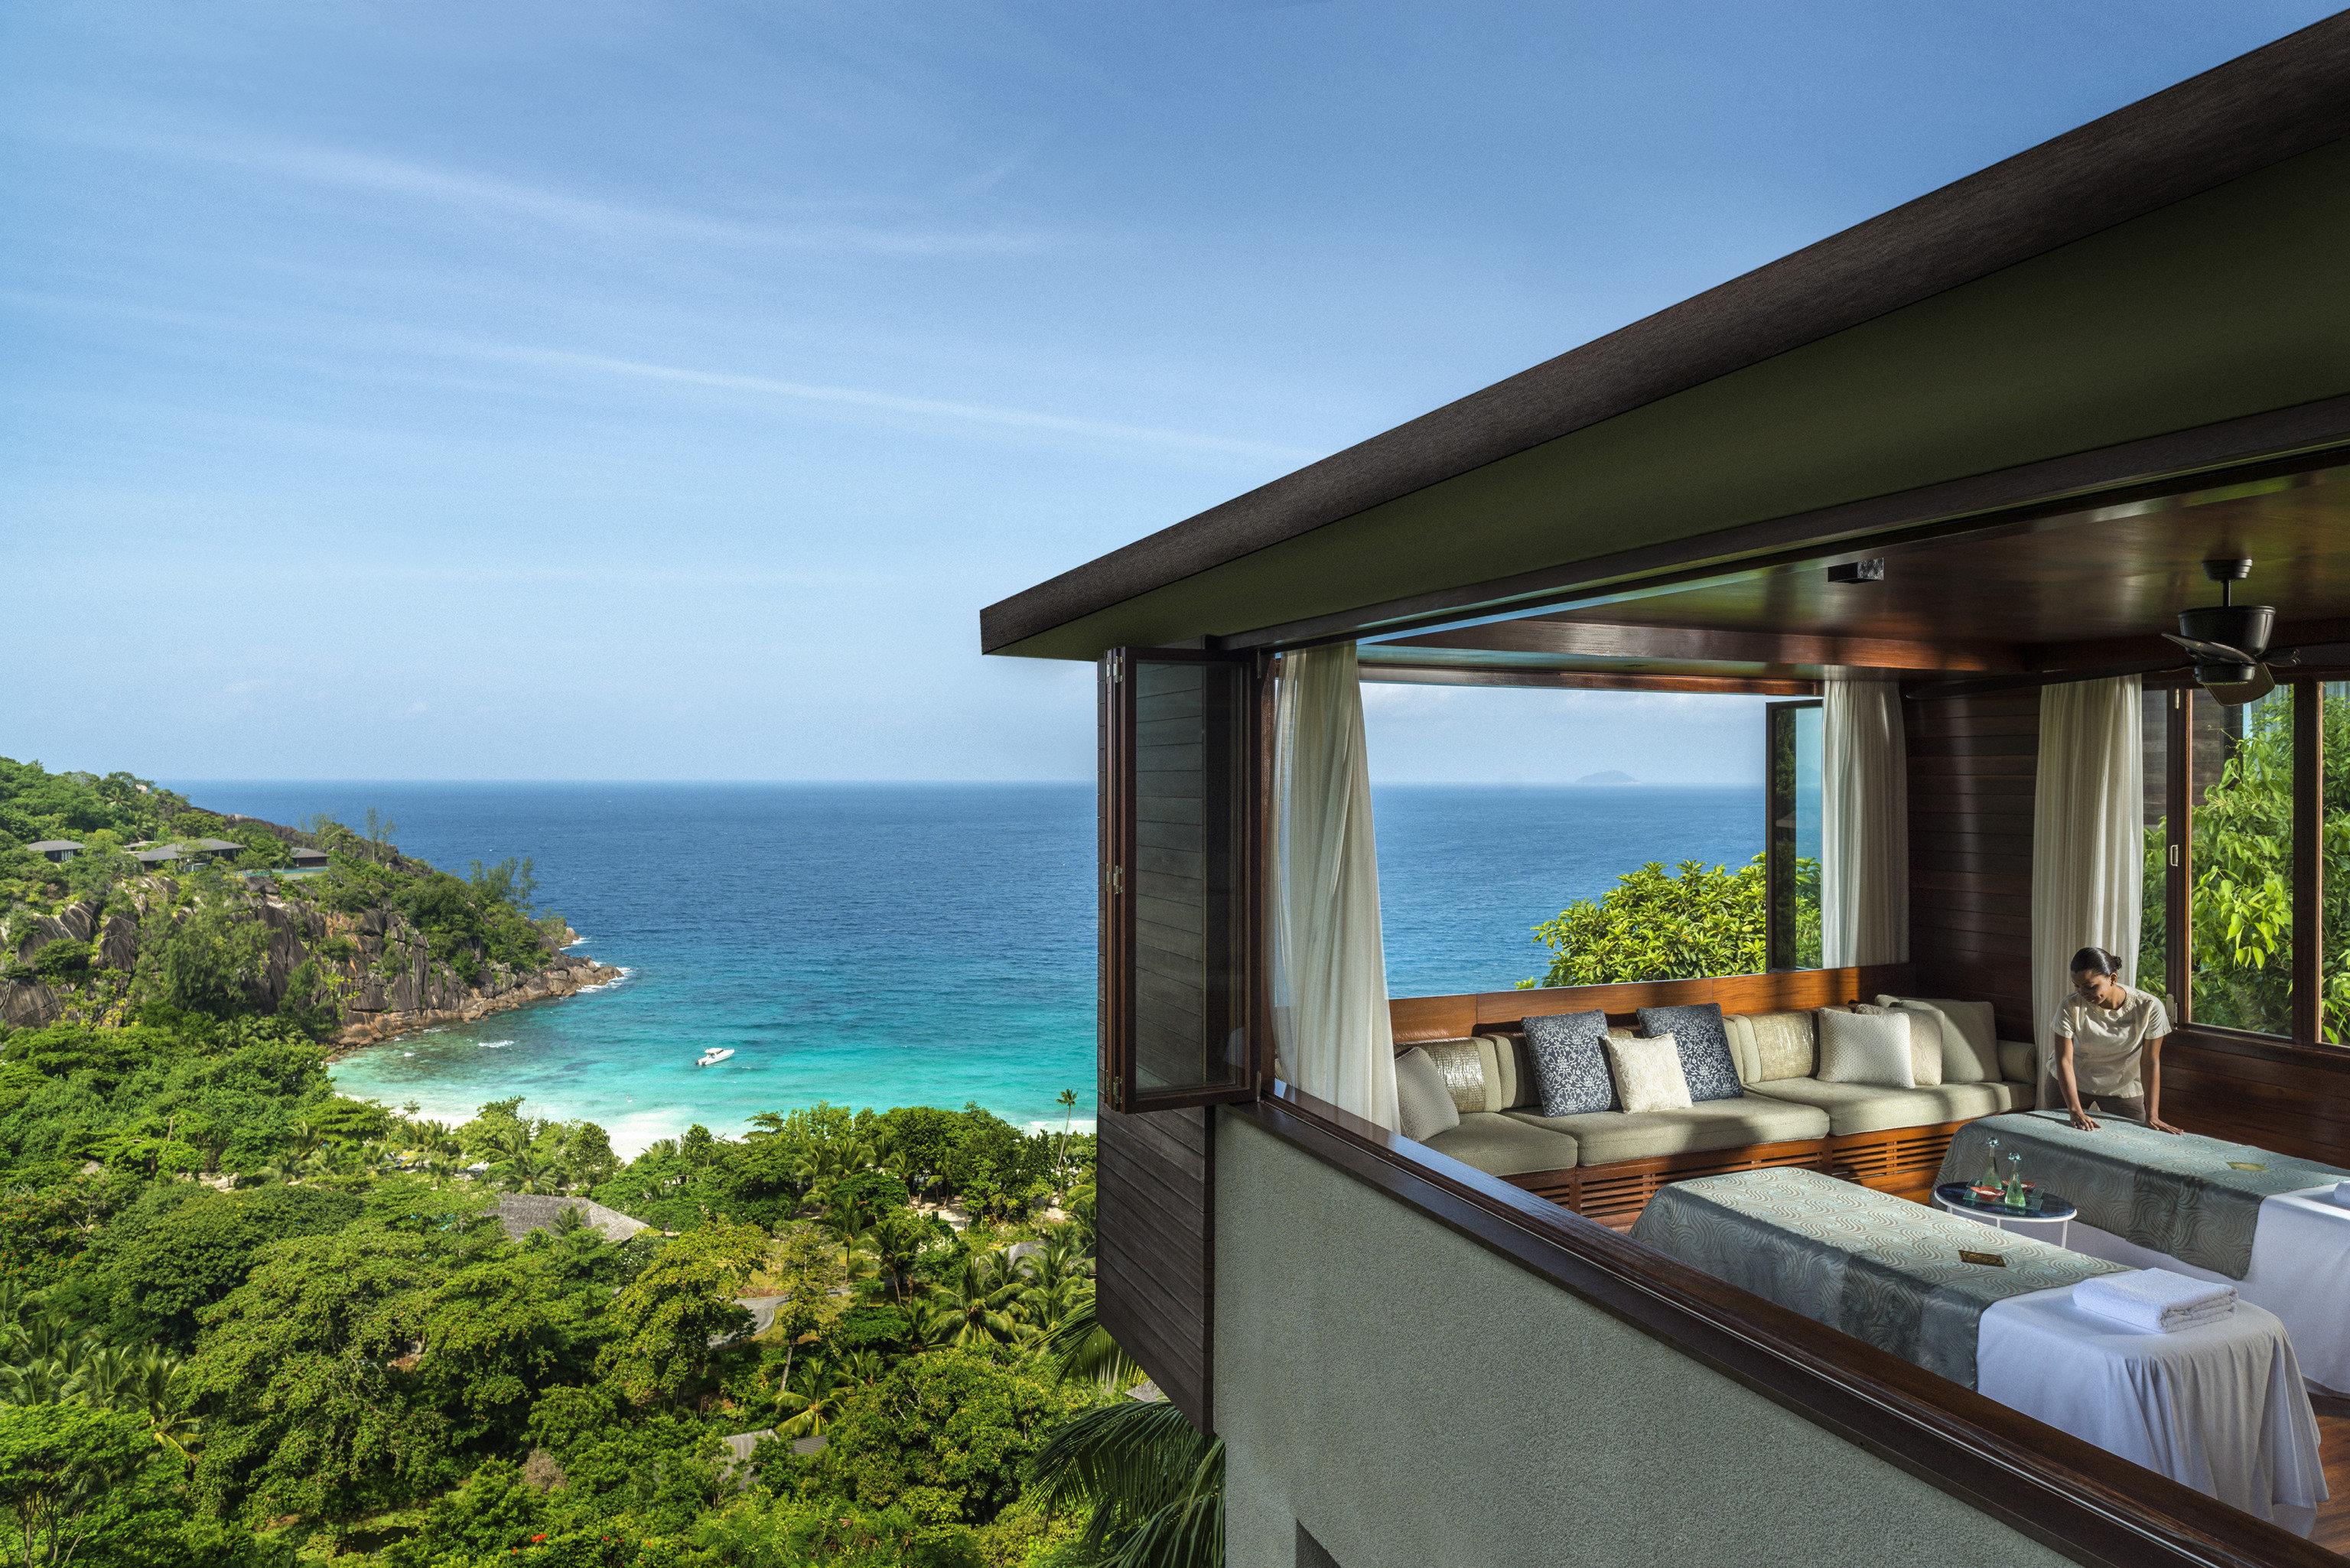 sky water property Villa Resort home caribbean overlooking cottage condominium Sea Island